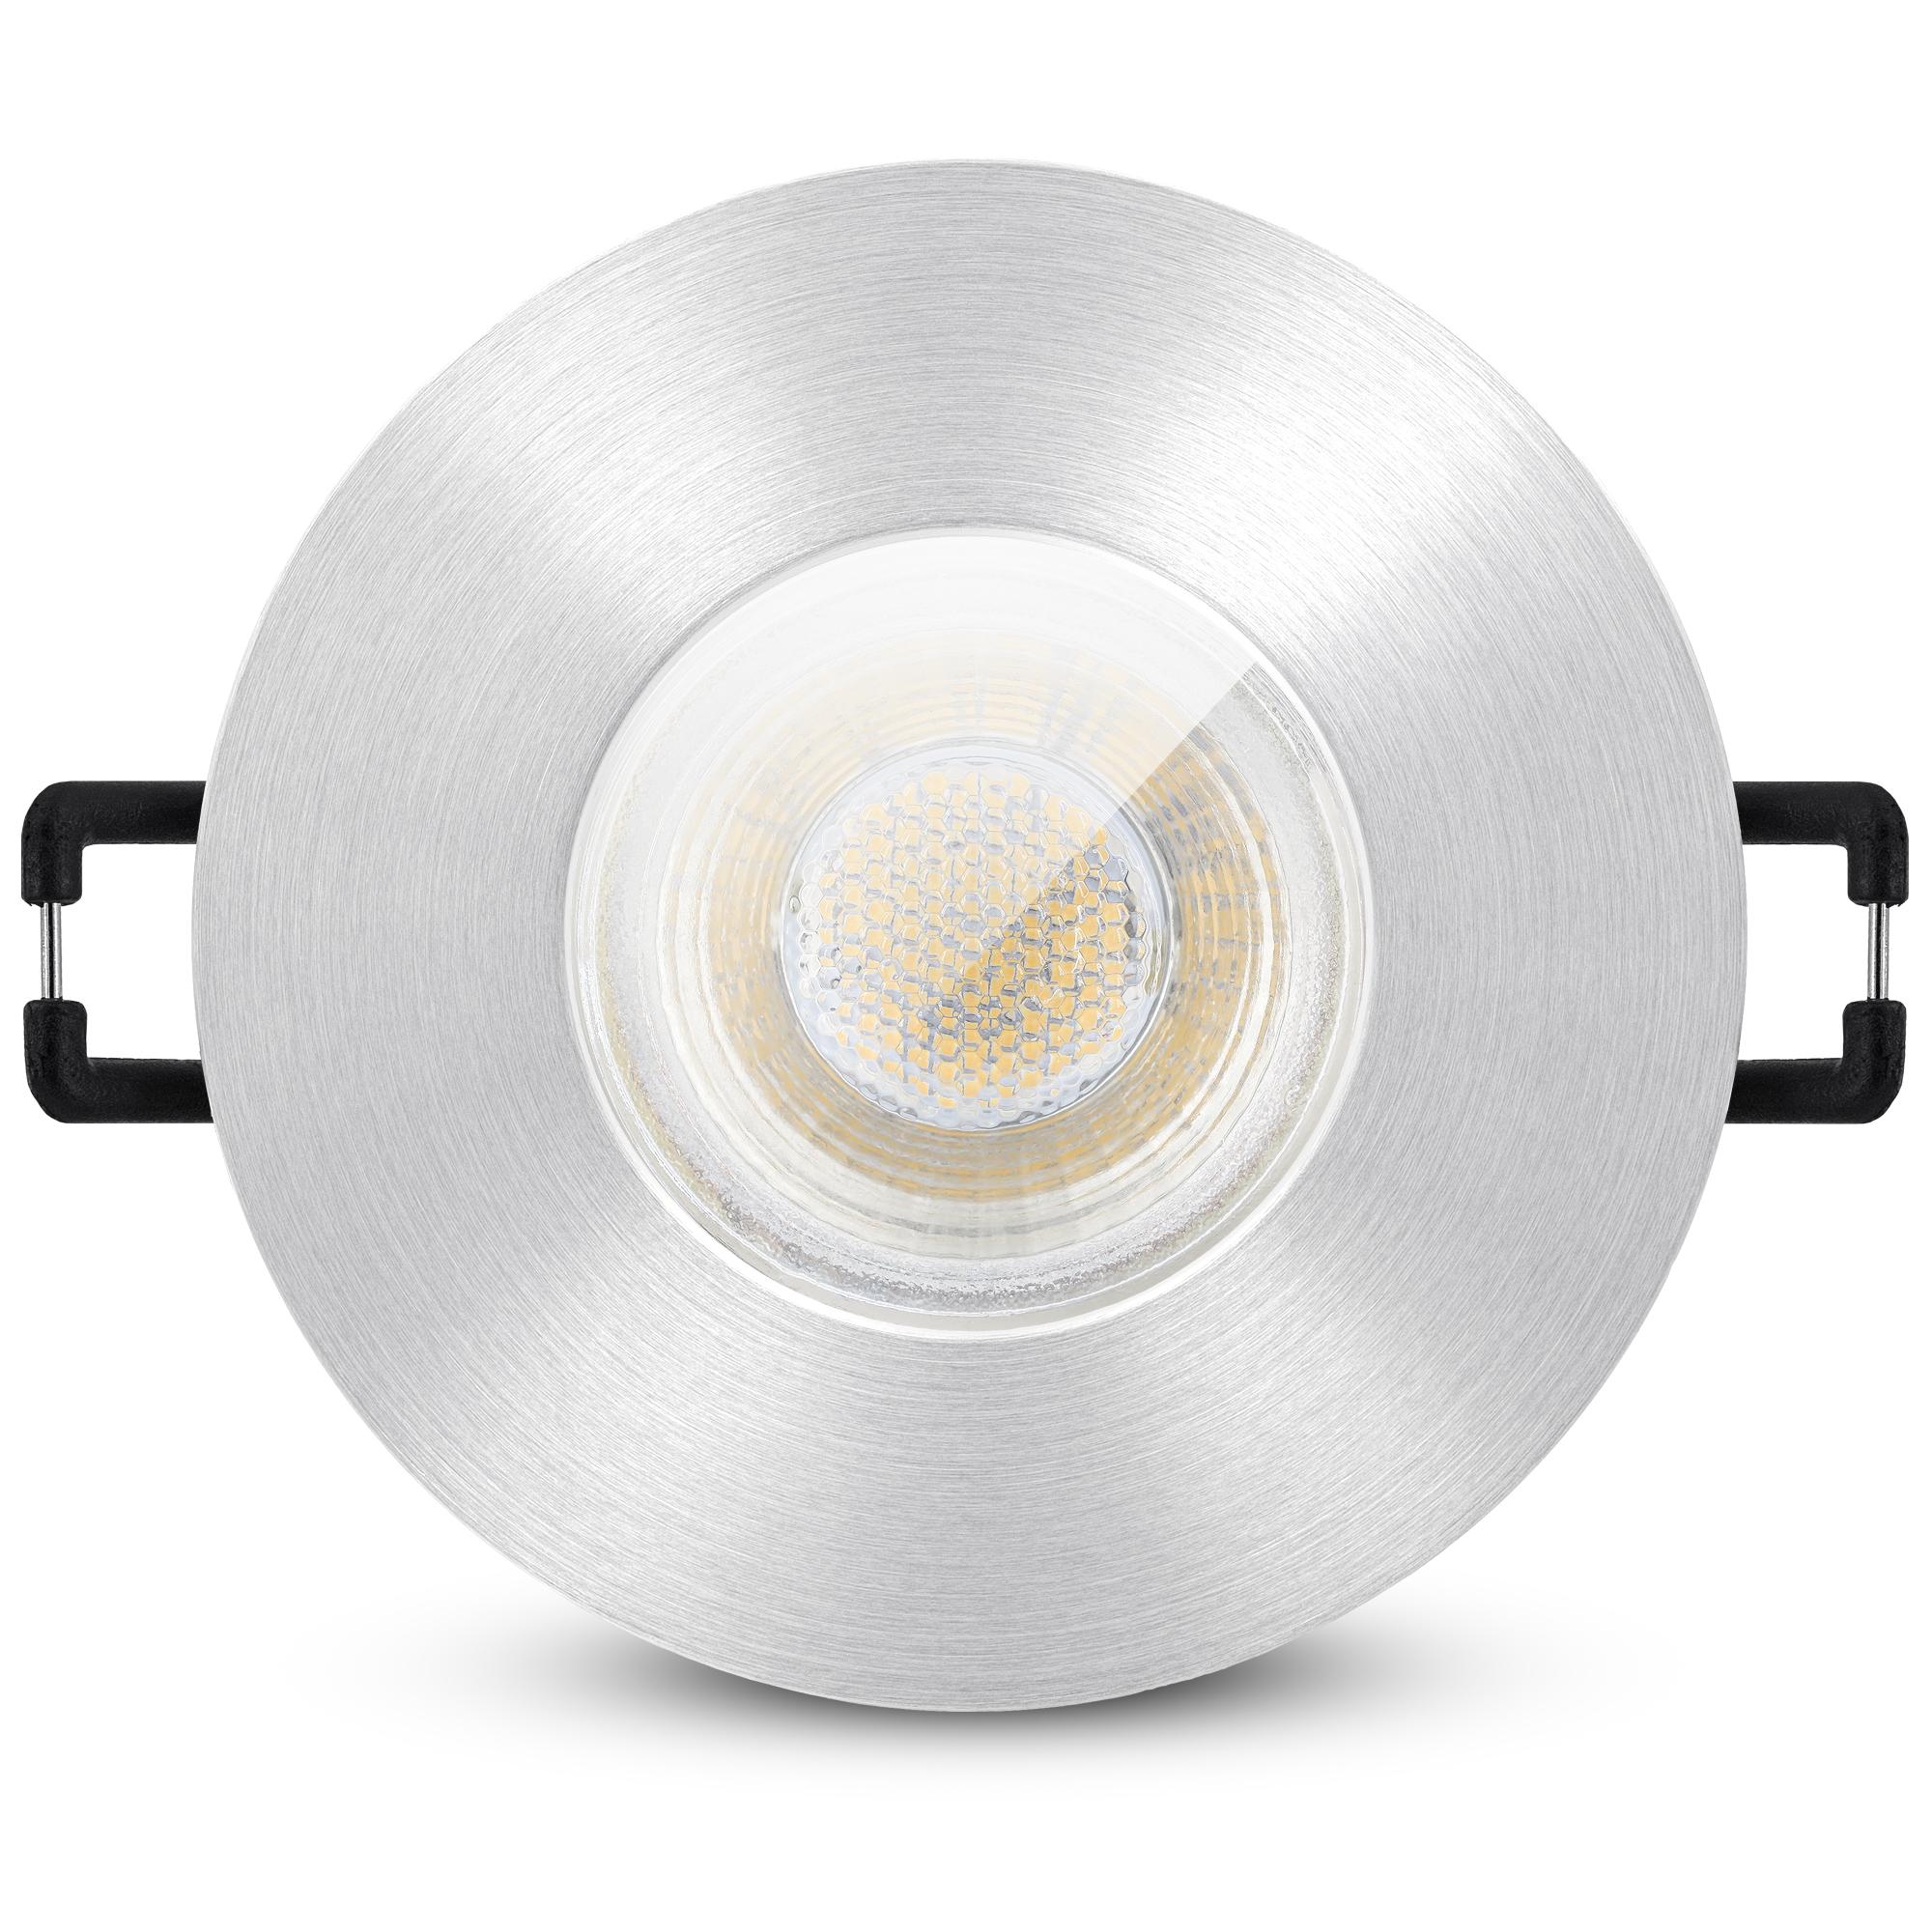 LED Bad Einbaustrahler IP20 GU20 20W neutralweiß 20V   Edelstahl ...